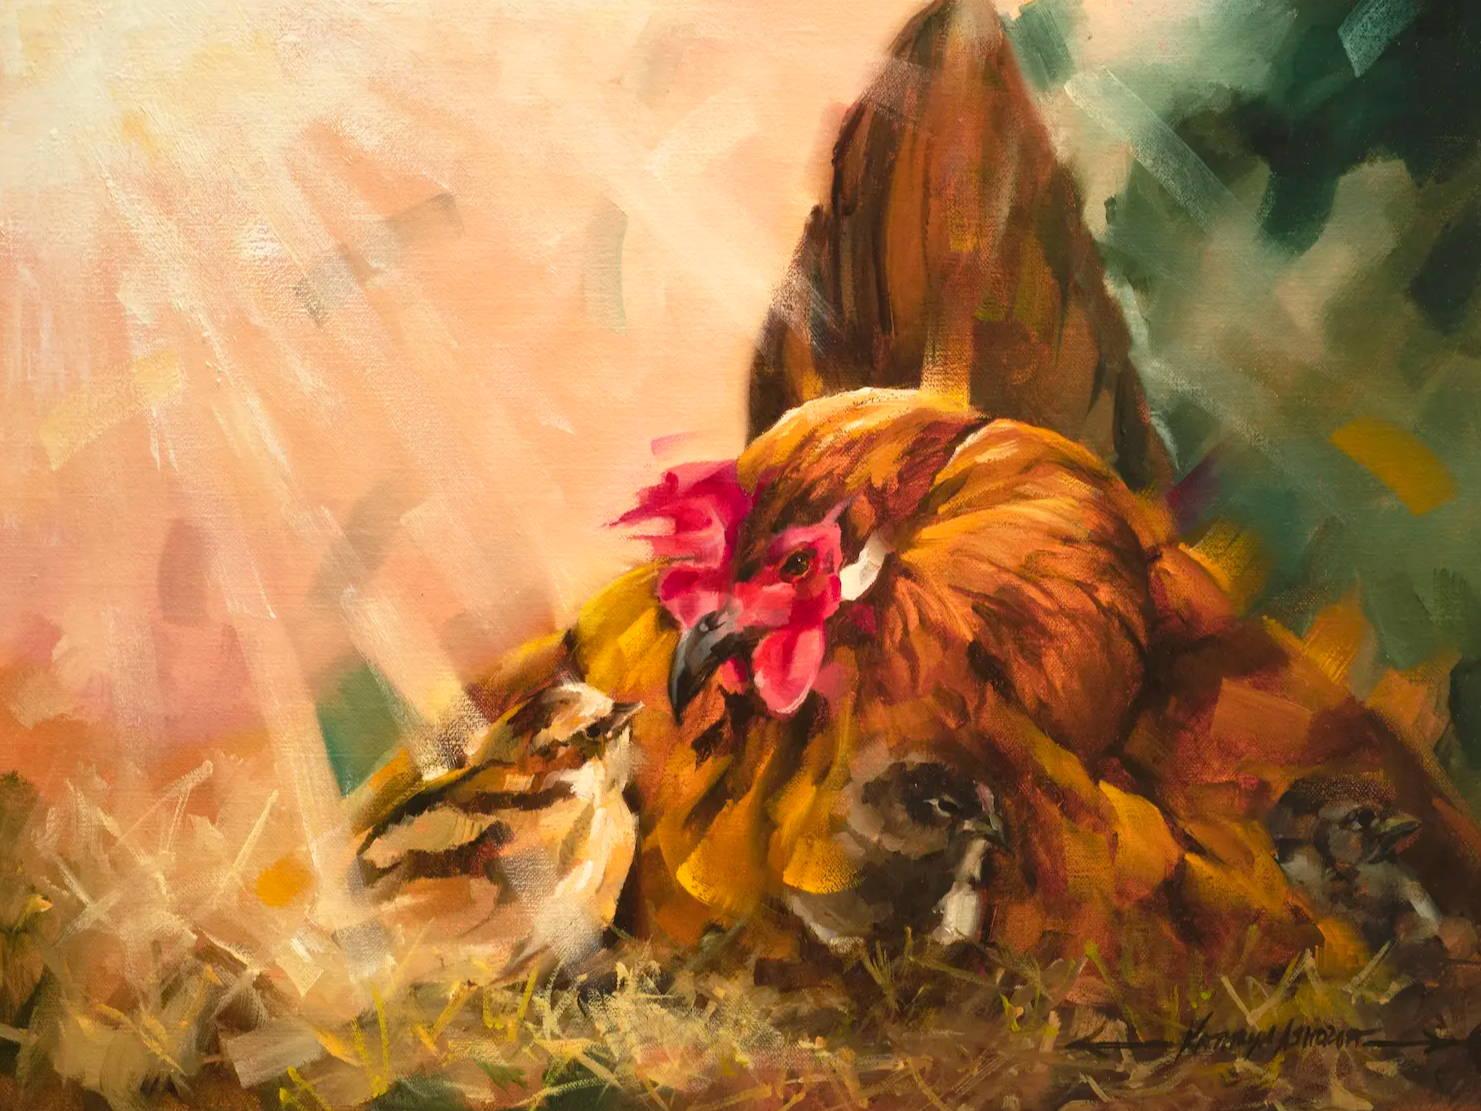 Kathryn Ashcroft. Shanan Campbell. Santa Fe Art Gallery. Art consulting. Durango Art Gallery. Online fine art gallery.